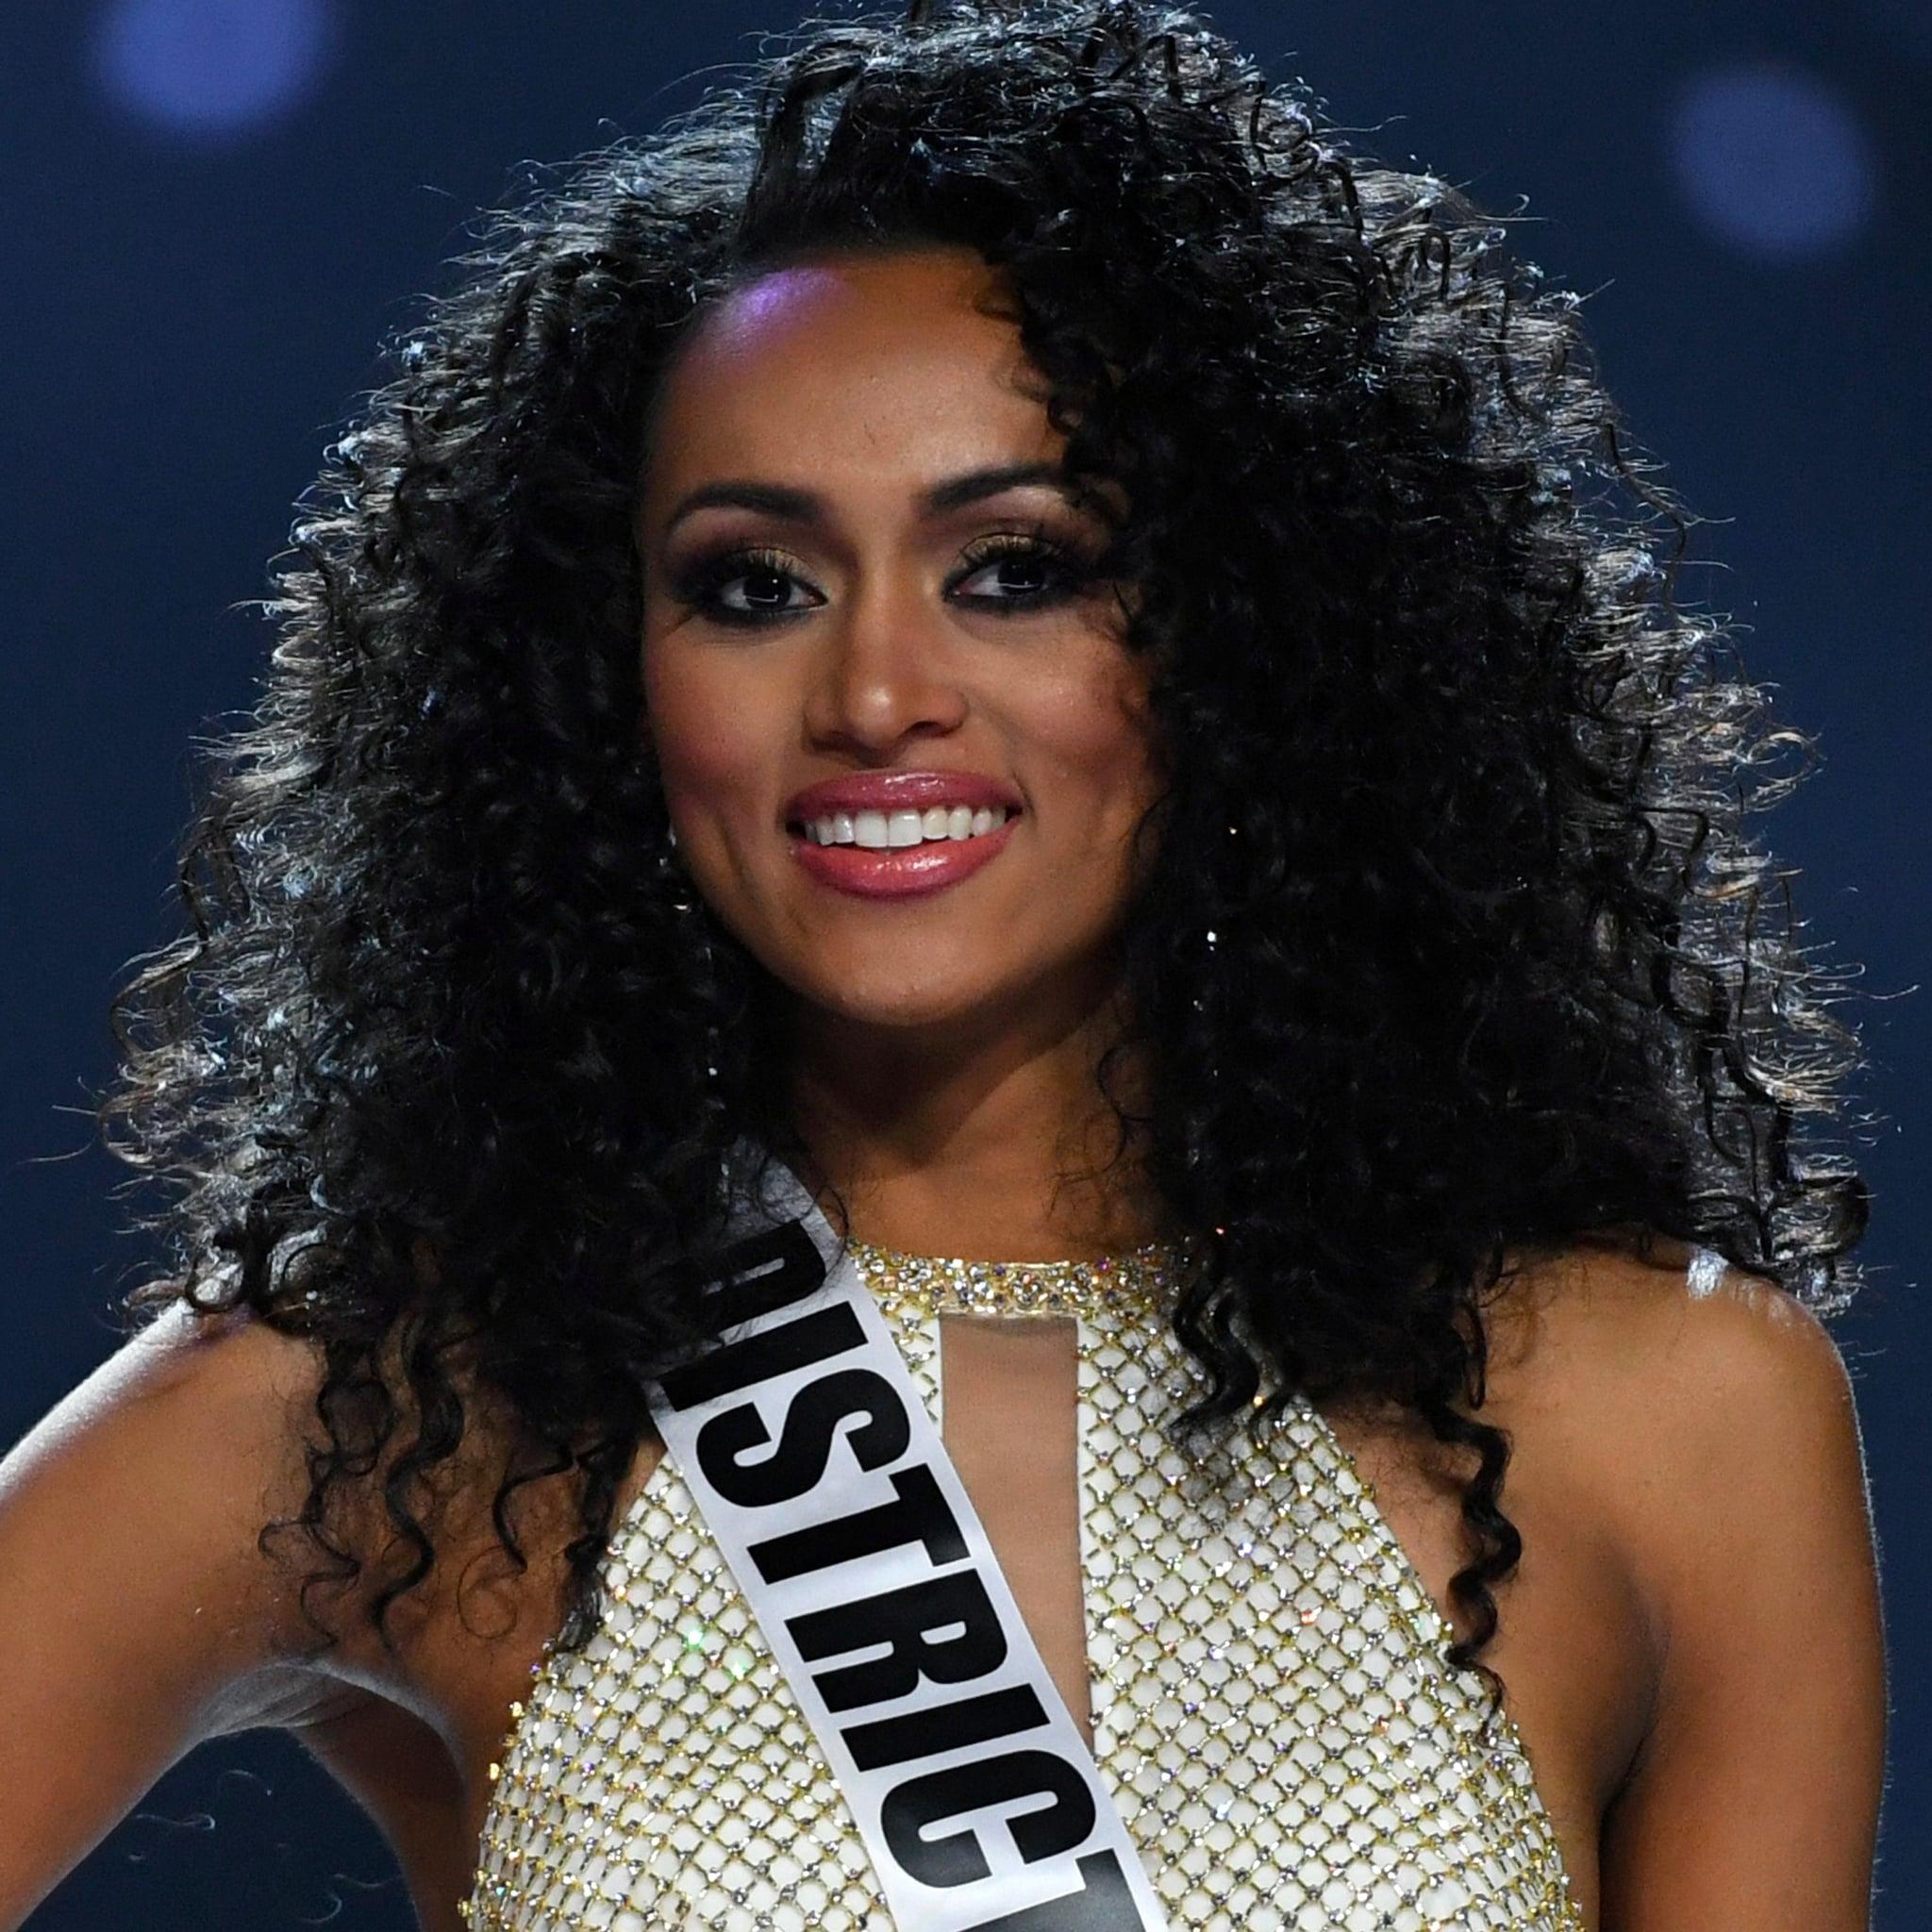 RUMBO A MISS UNIVERSO 2017 Miss-USA-Kara-McCullough-Natural-Hair